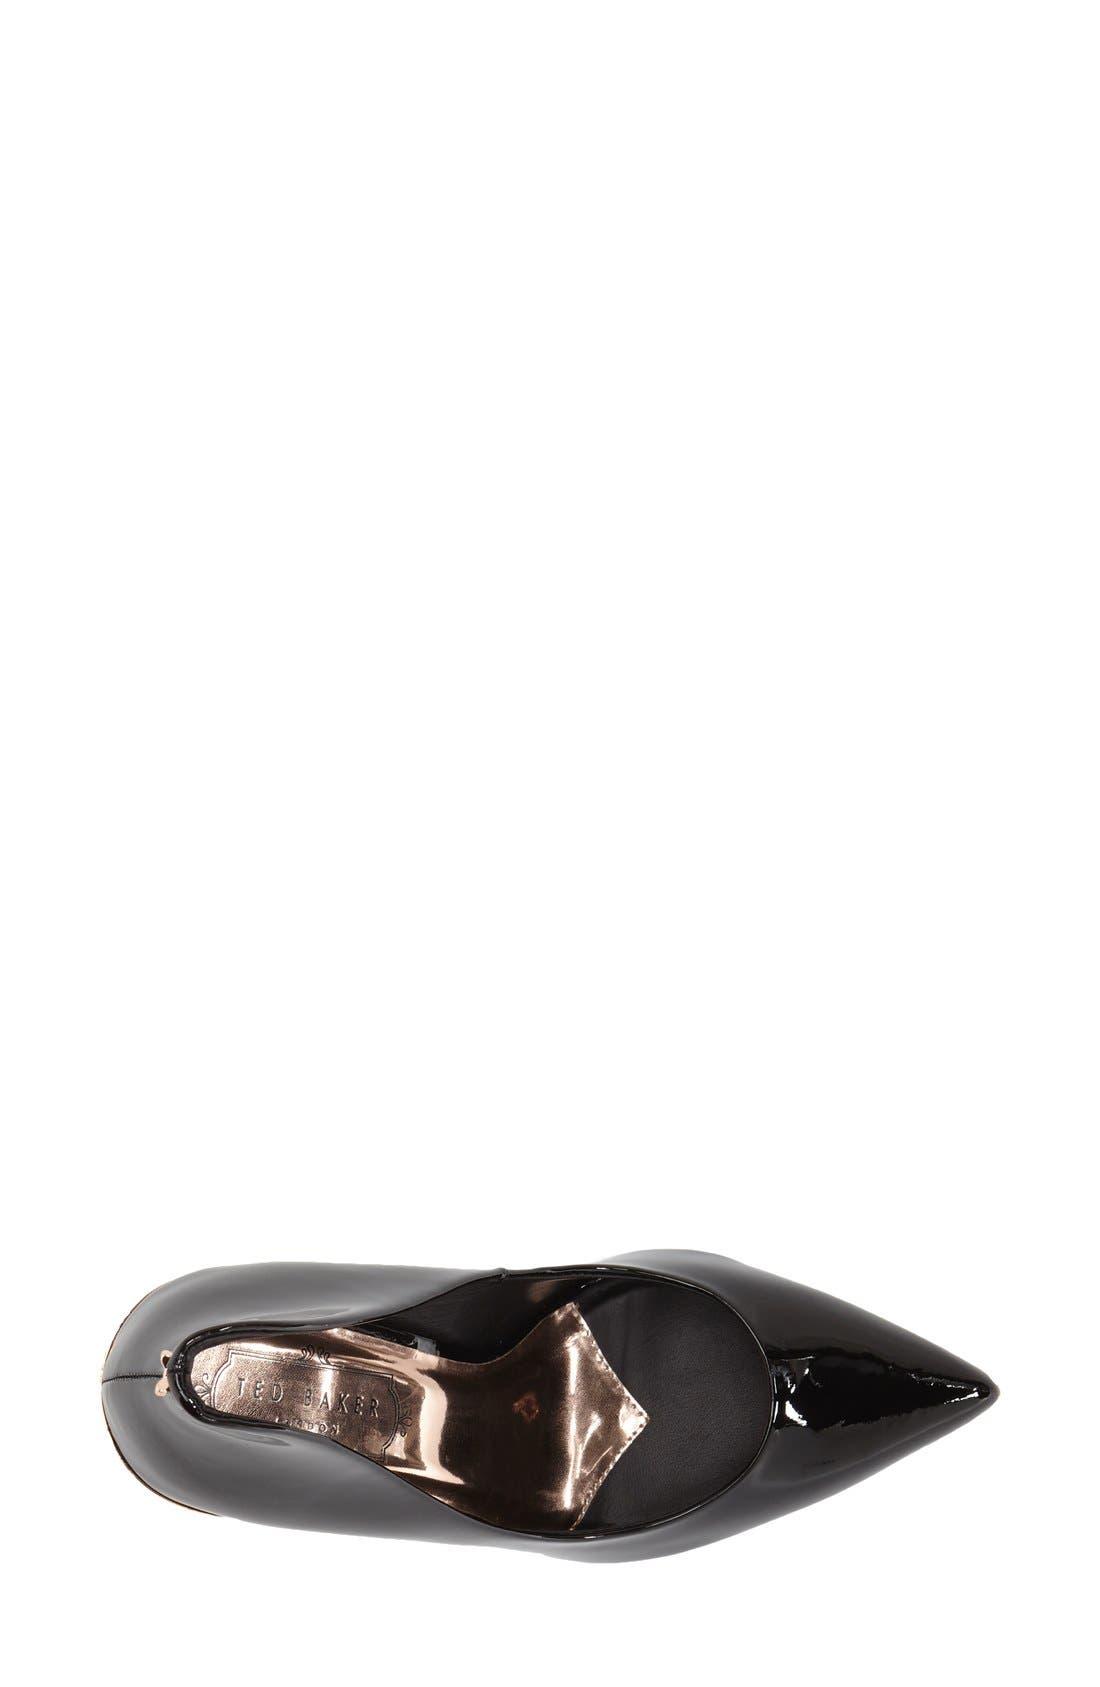 Alternate Image 3  - Ted Baker London 'Savenniers' Pointy Toe Pump (Women)